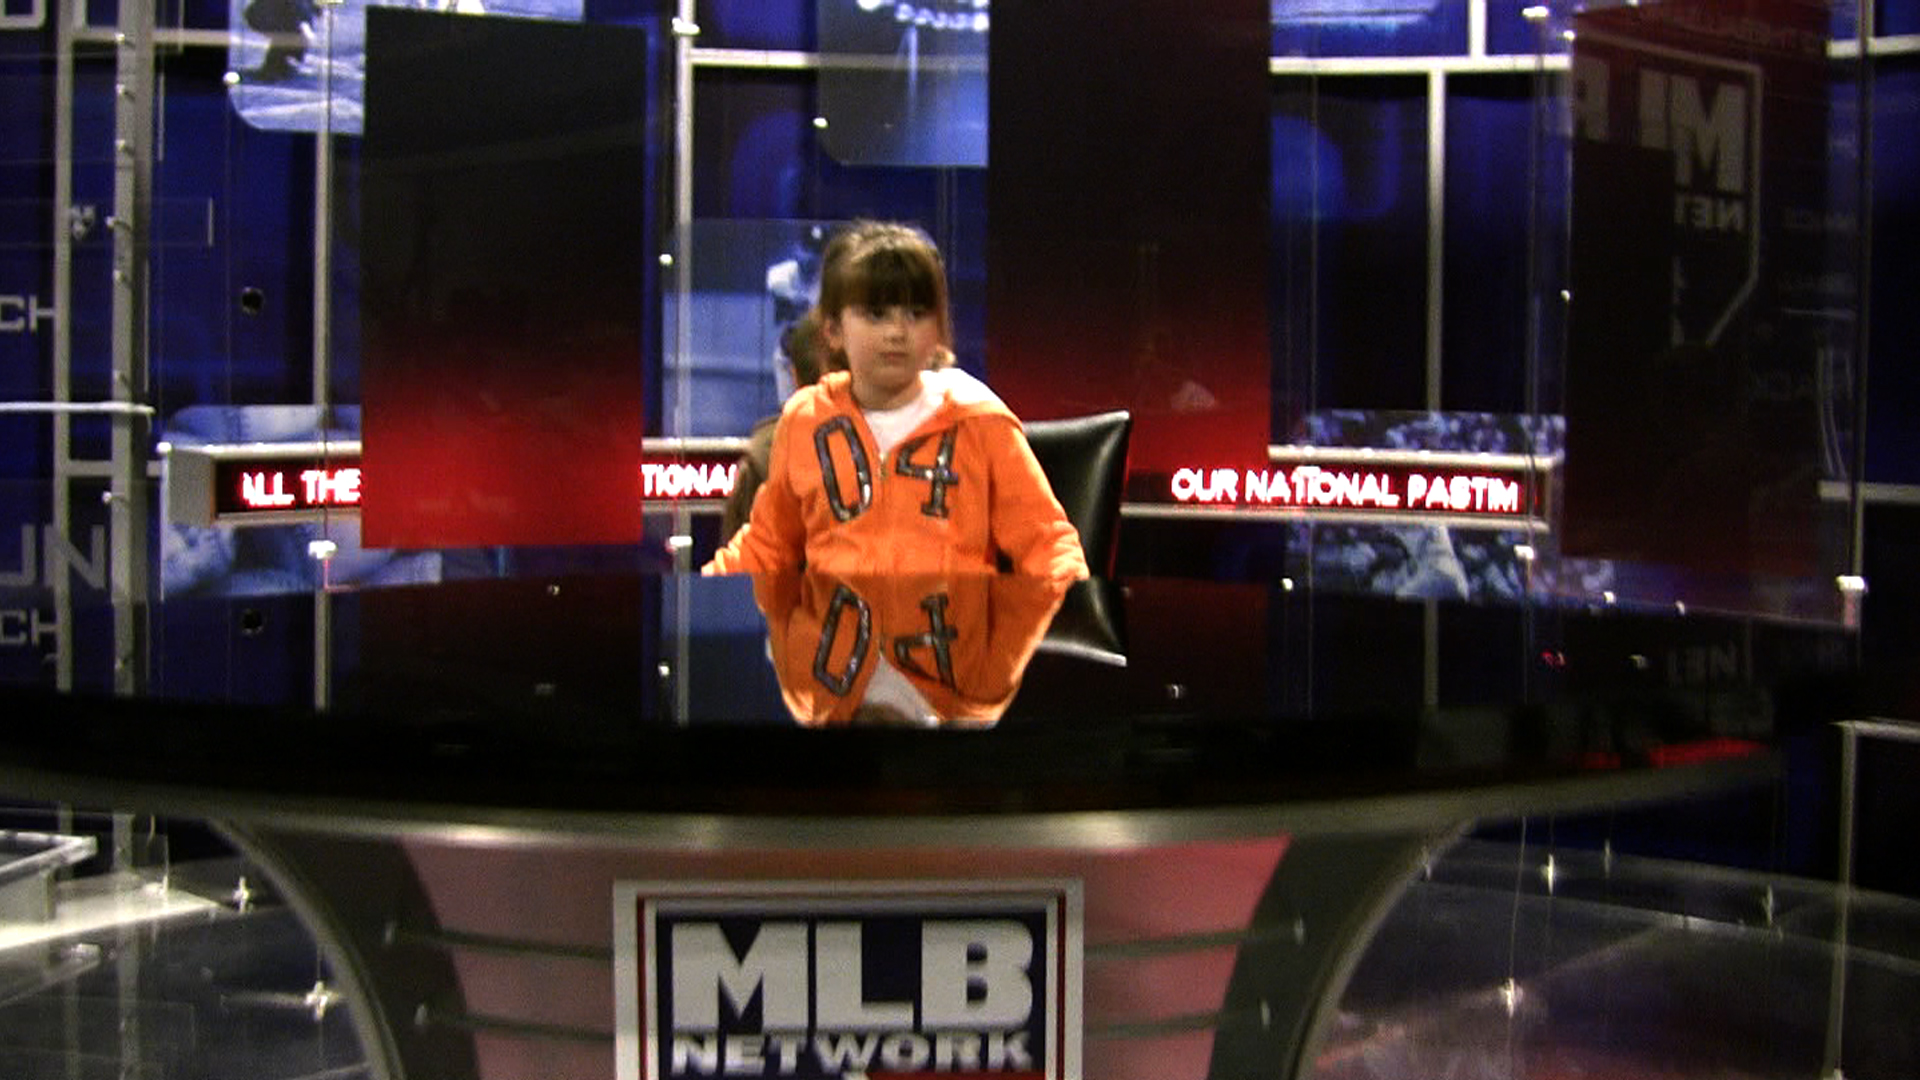 Kids at MLB Network 4.jpg